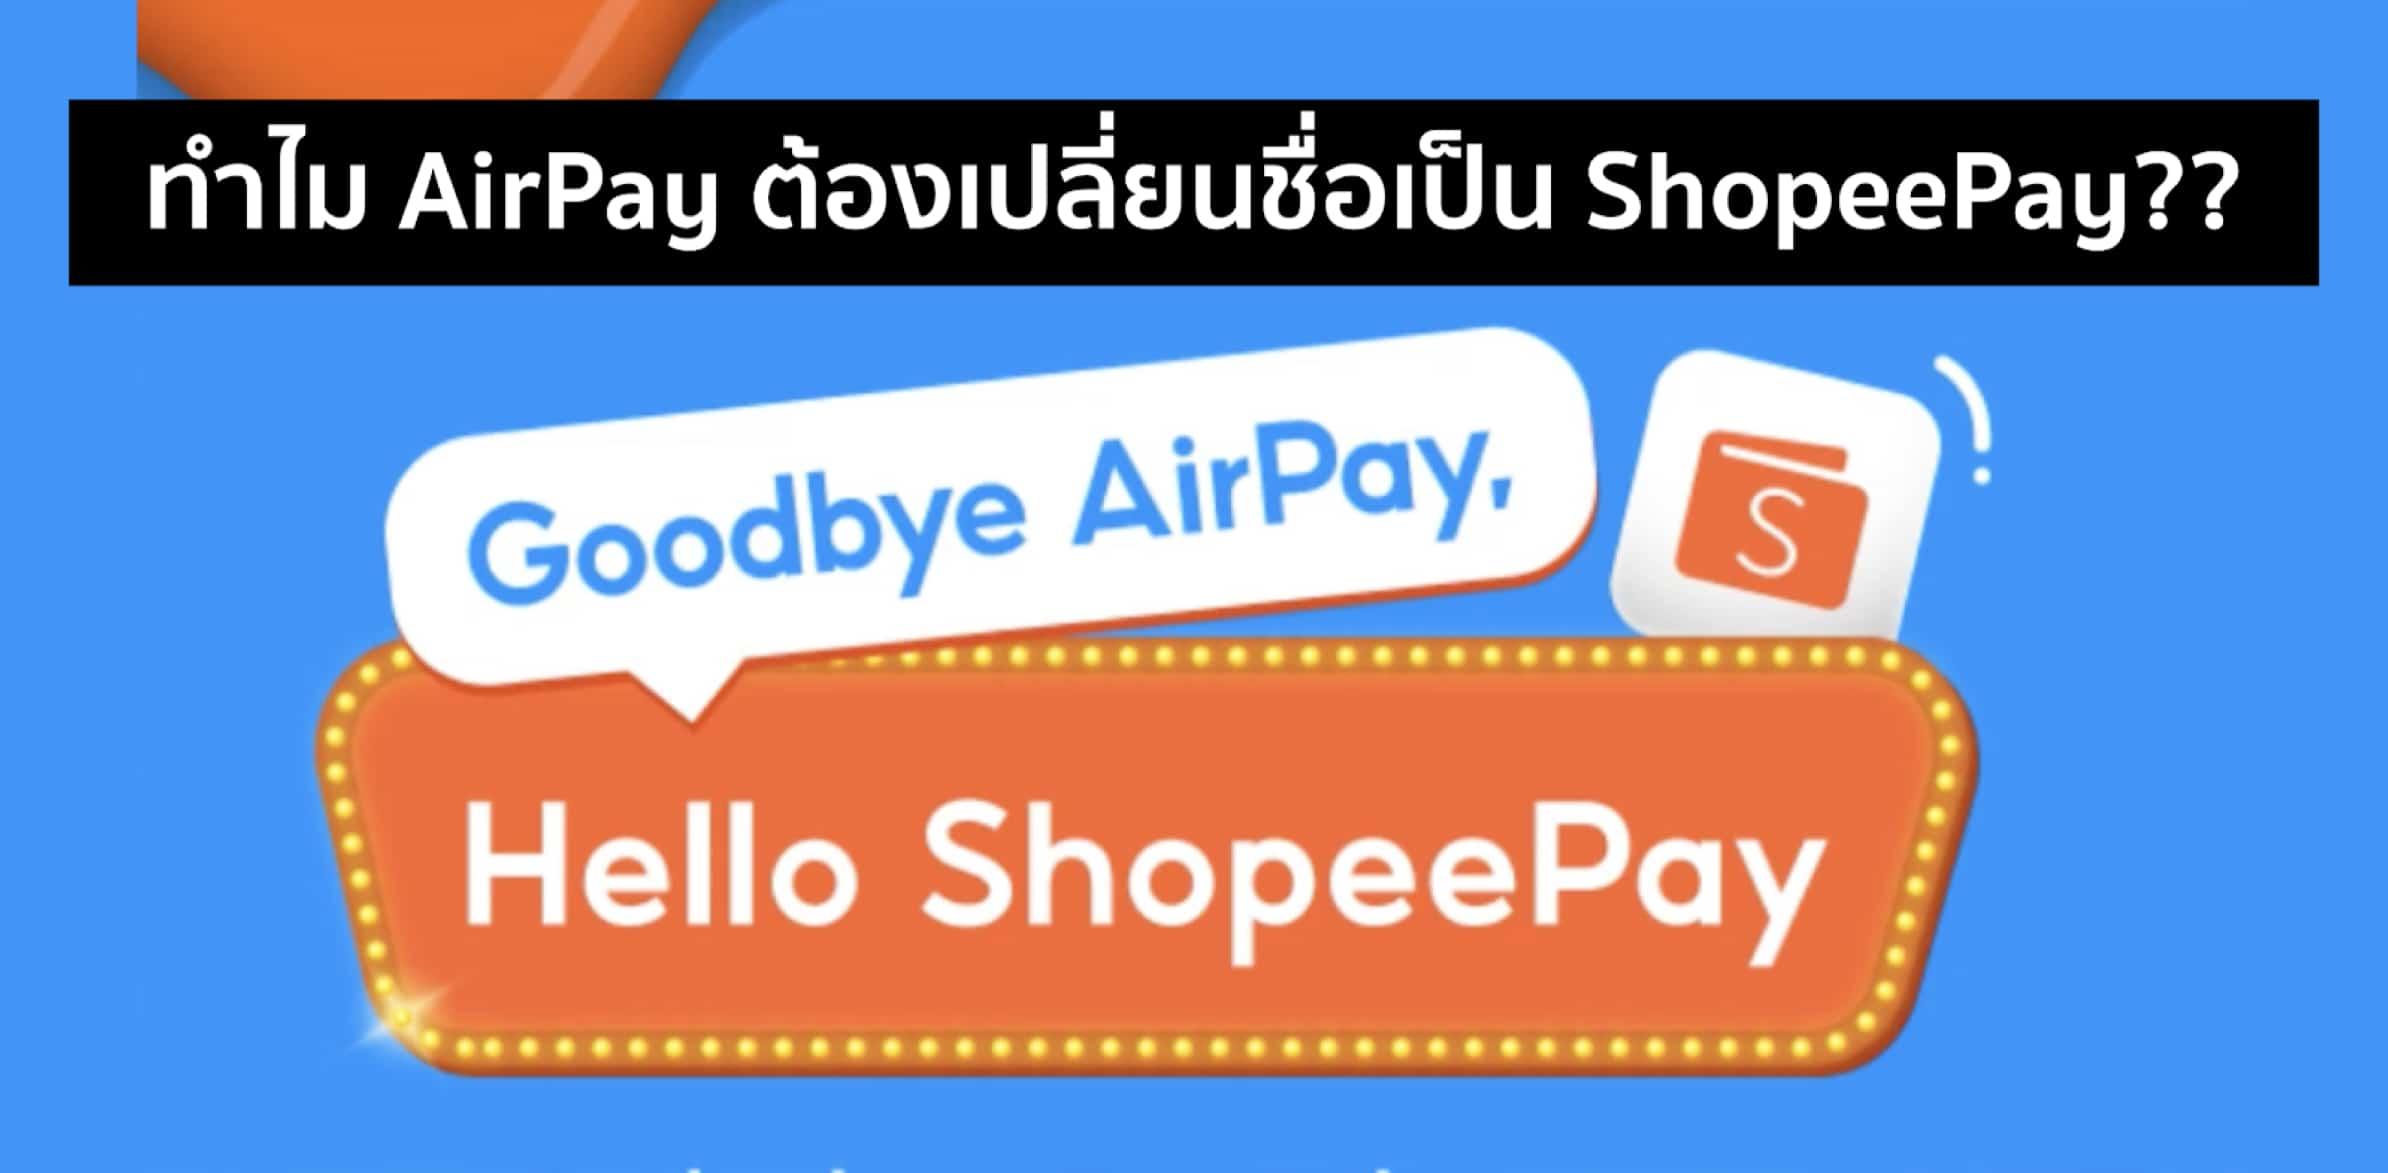 AirPay เปลี่ยนชื่อเป็น ShopeePay เพื่อขยายฐานลูกค้า และตอบโจทย์การใช้งานของคนไทยมากขึ้น